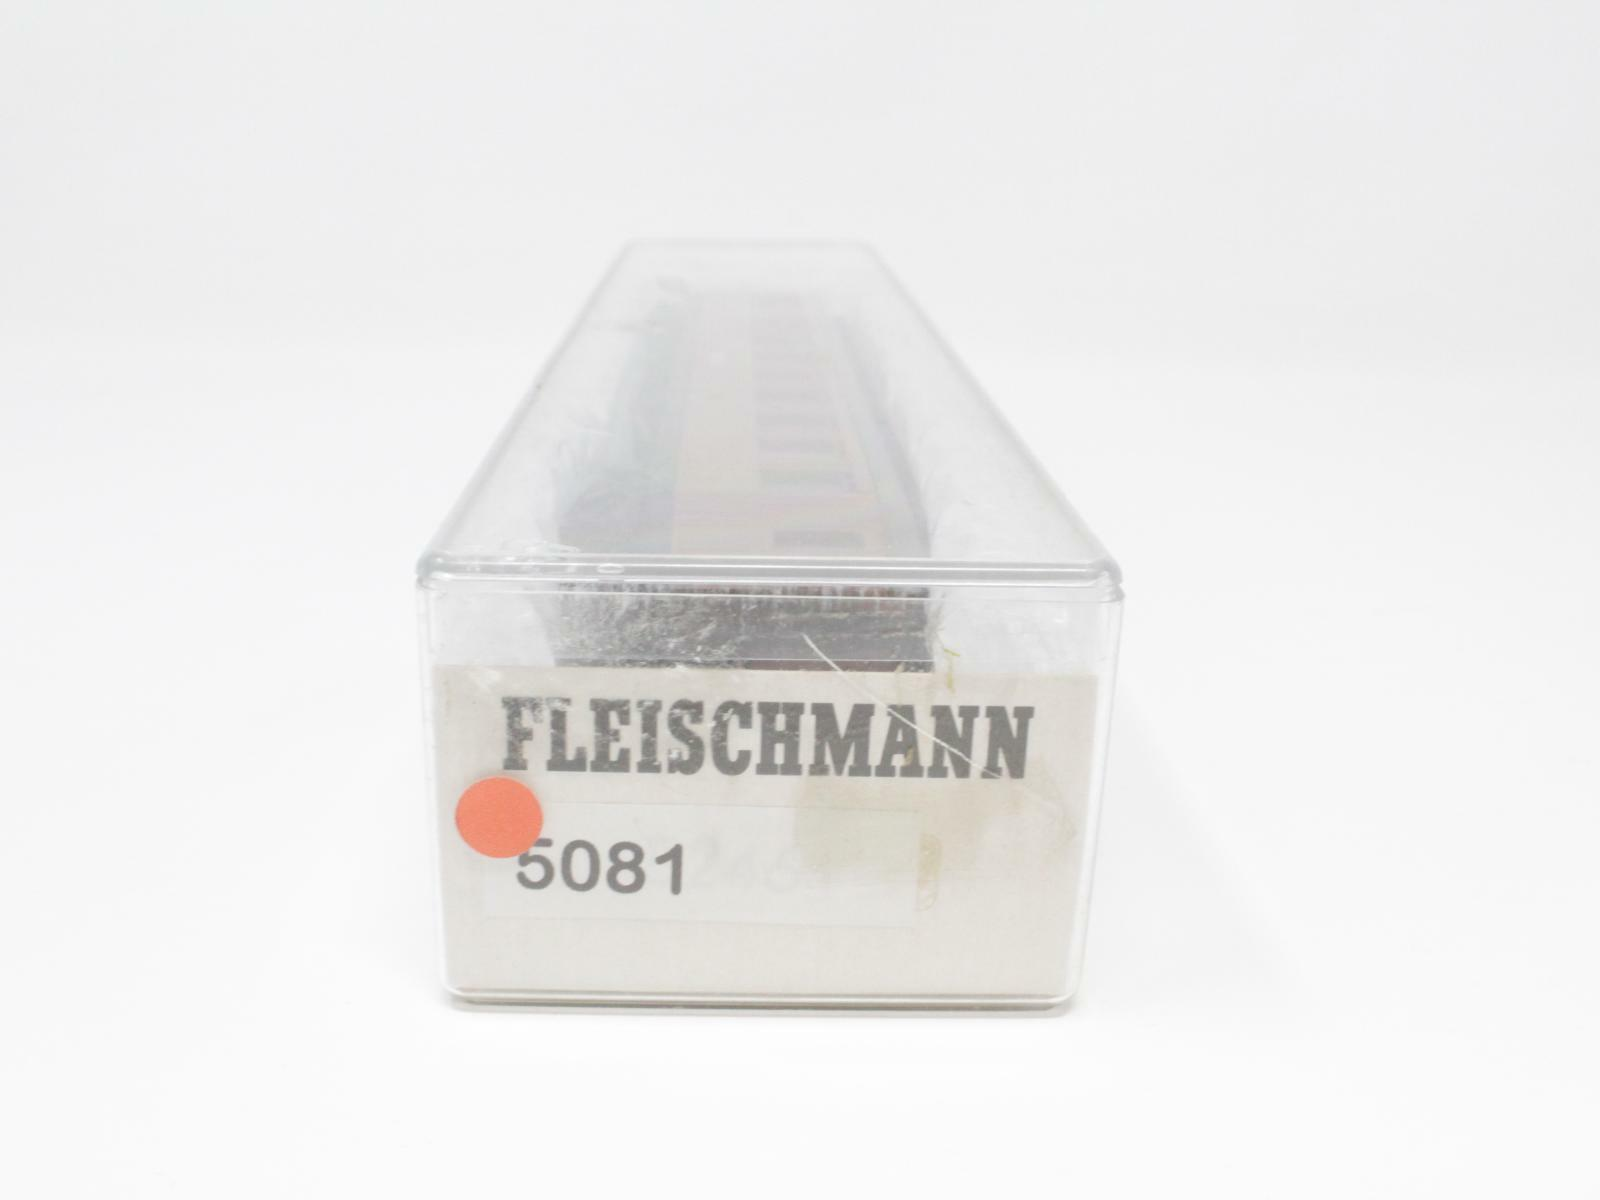 FLEISCHMANN H0 5081 VAGONE RISTORANTE 798  EXPRESS MITROPA   MITROPA [NI3-017] 67244c